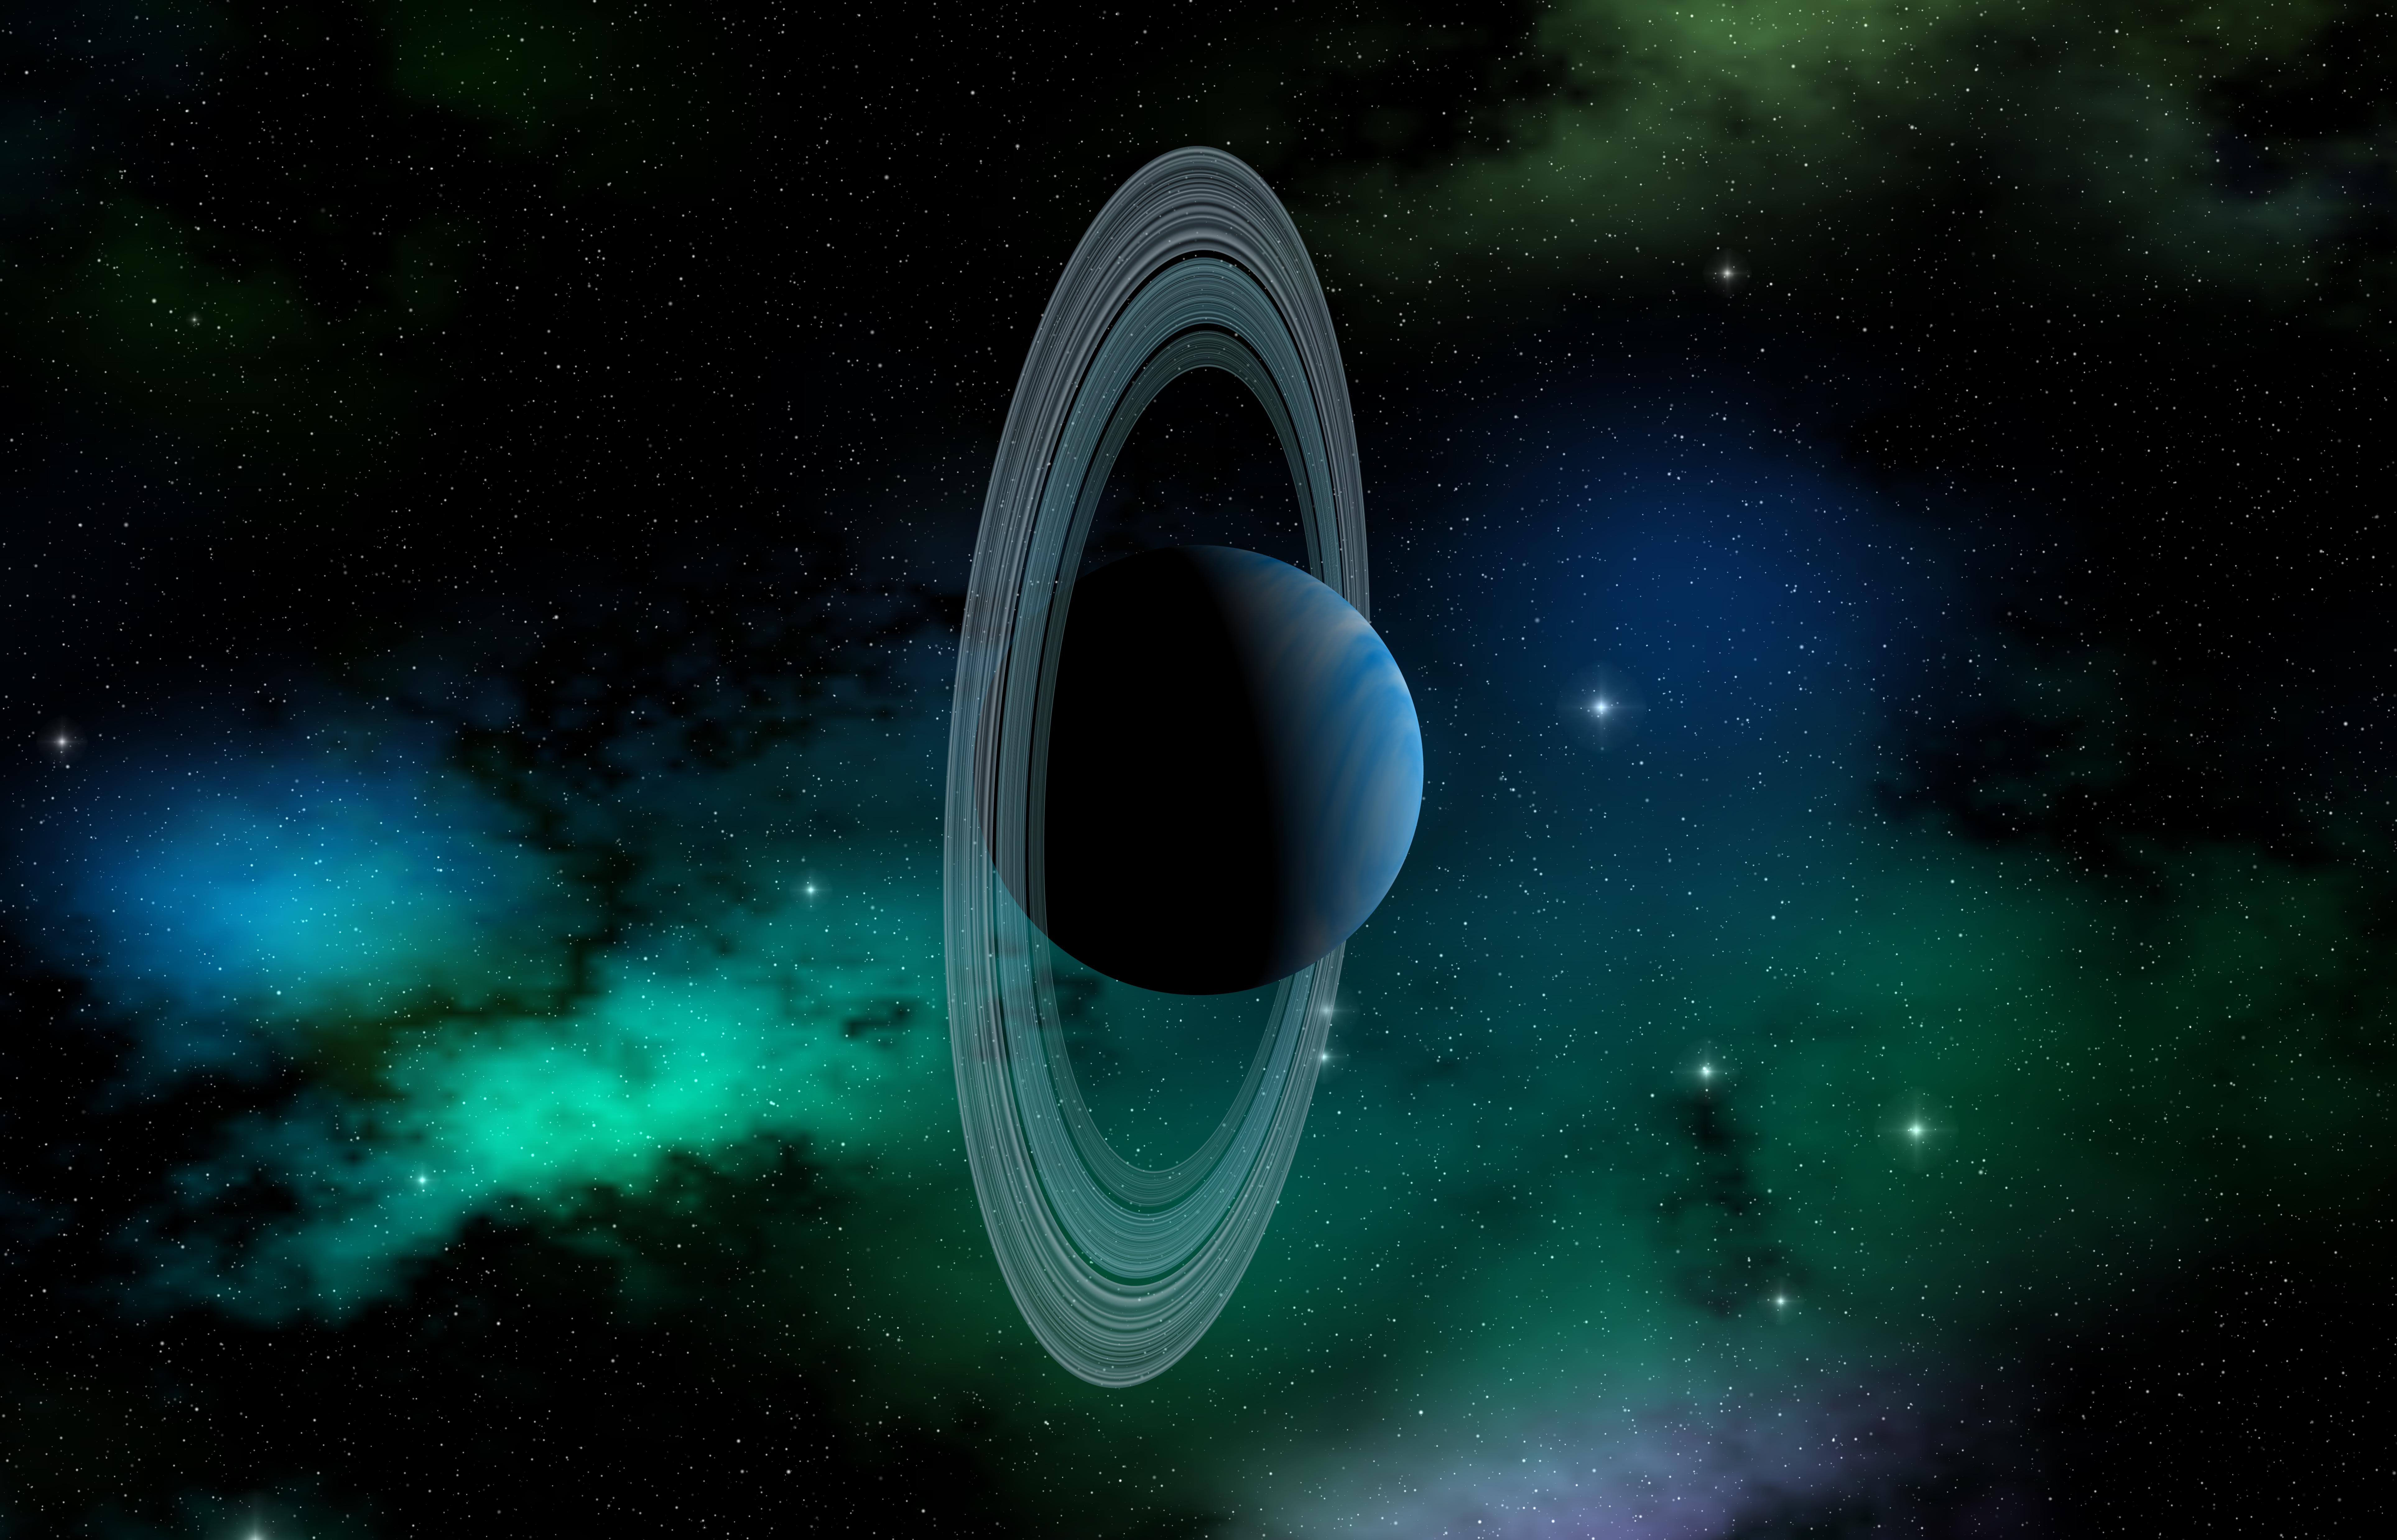 planet uranus rings - photo #35